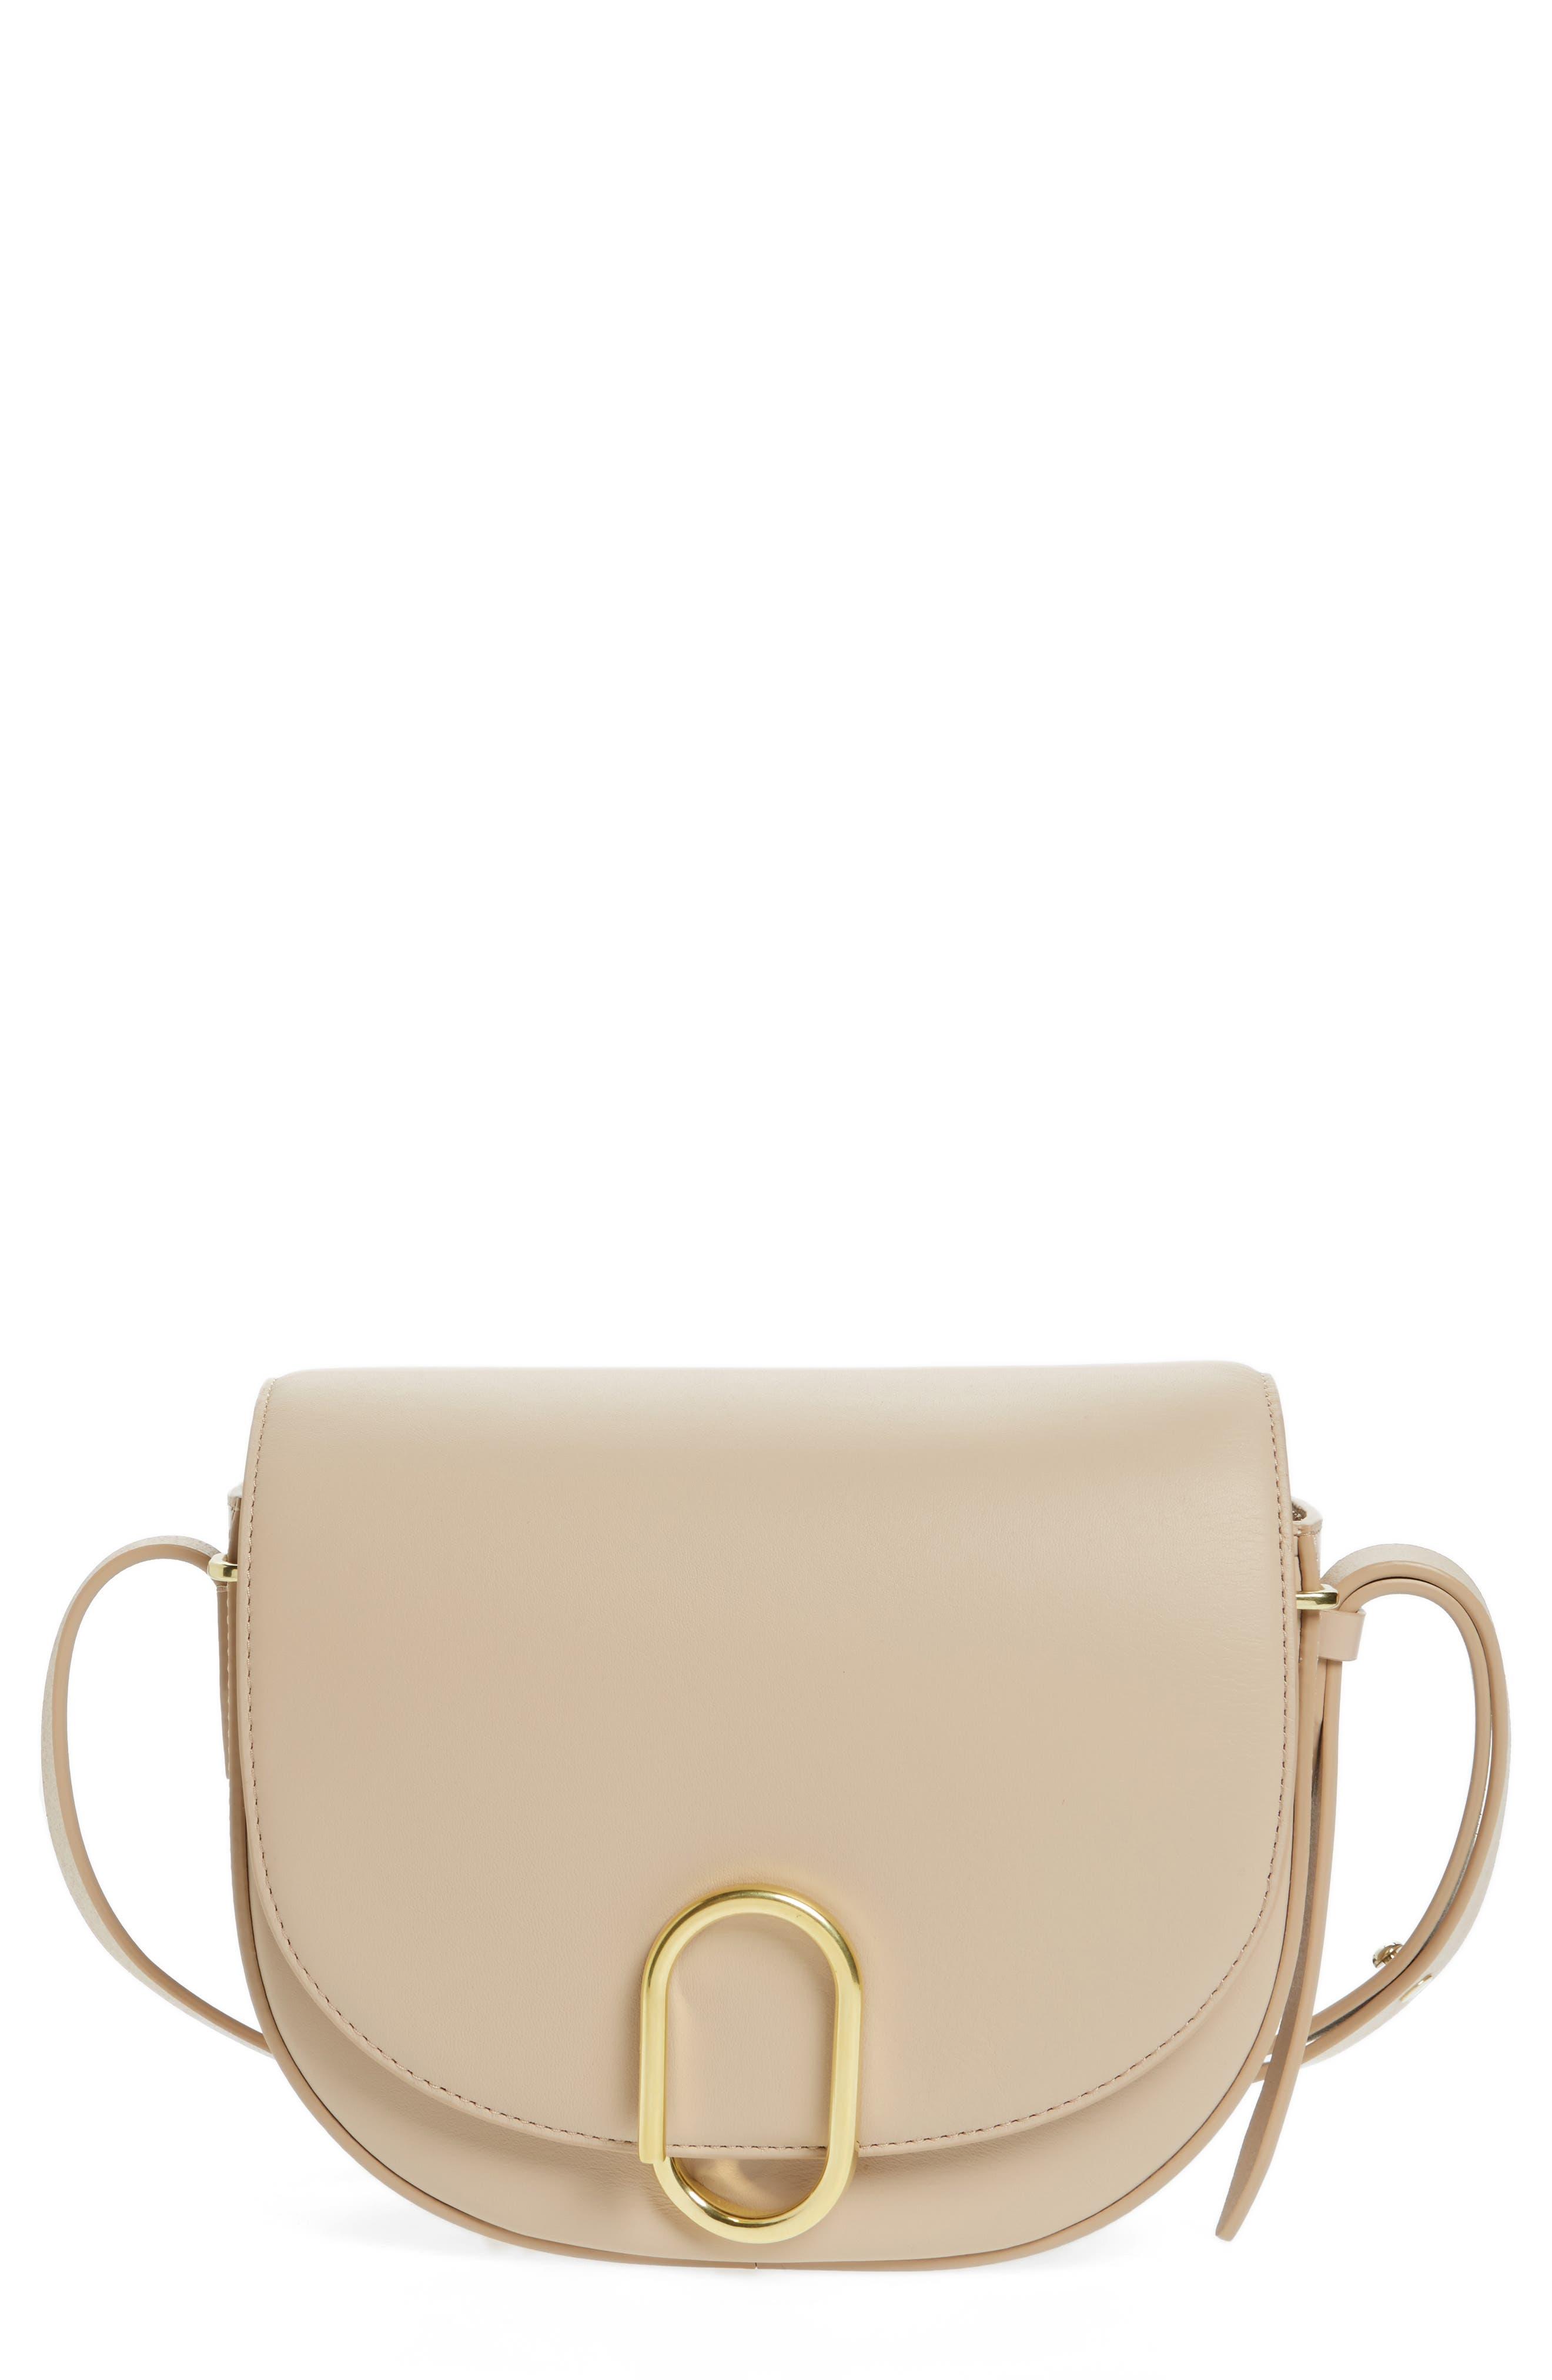 Alix Leather Saddle Bag,                             Main thumbnail 1, color,                             Cashew/ Gold